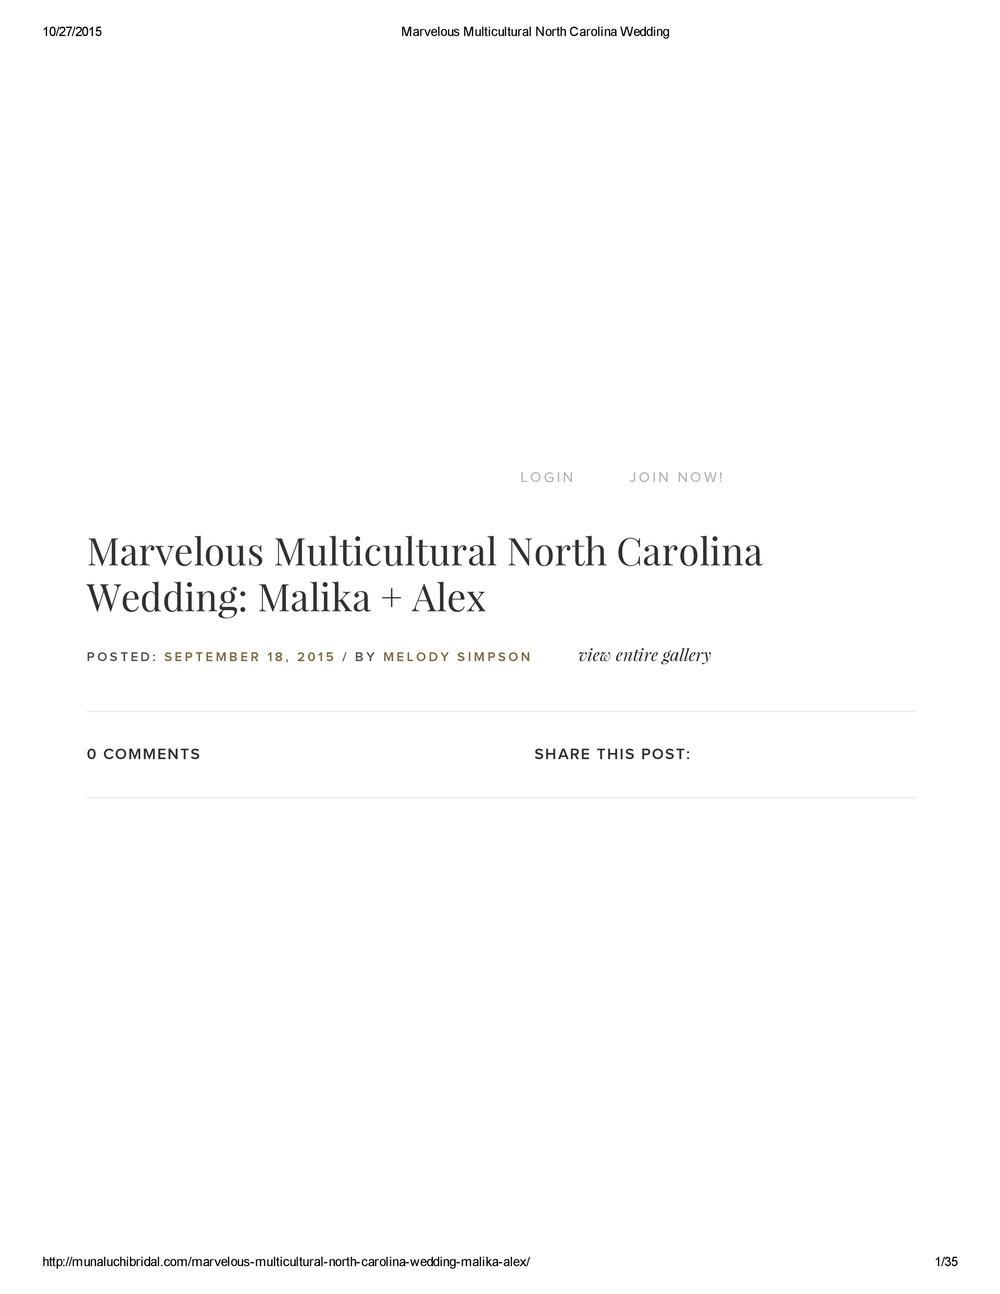 Marvelous Multicultural North Carolina Wedding - Alex & Malika-page-0.jpg